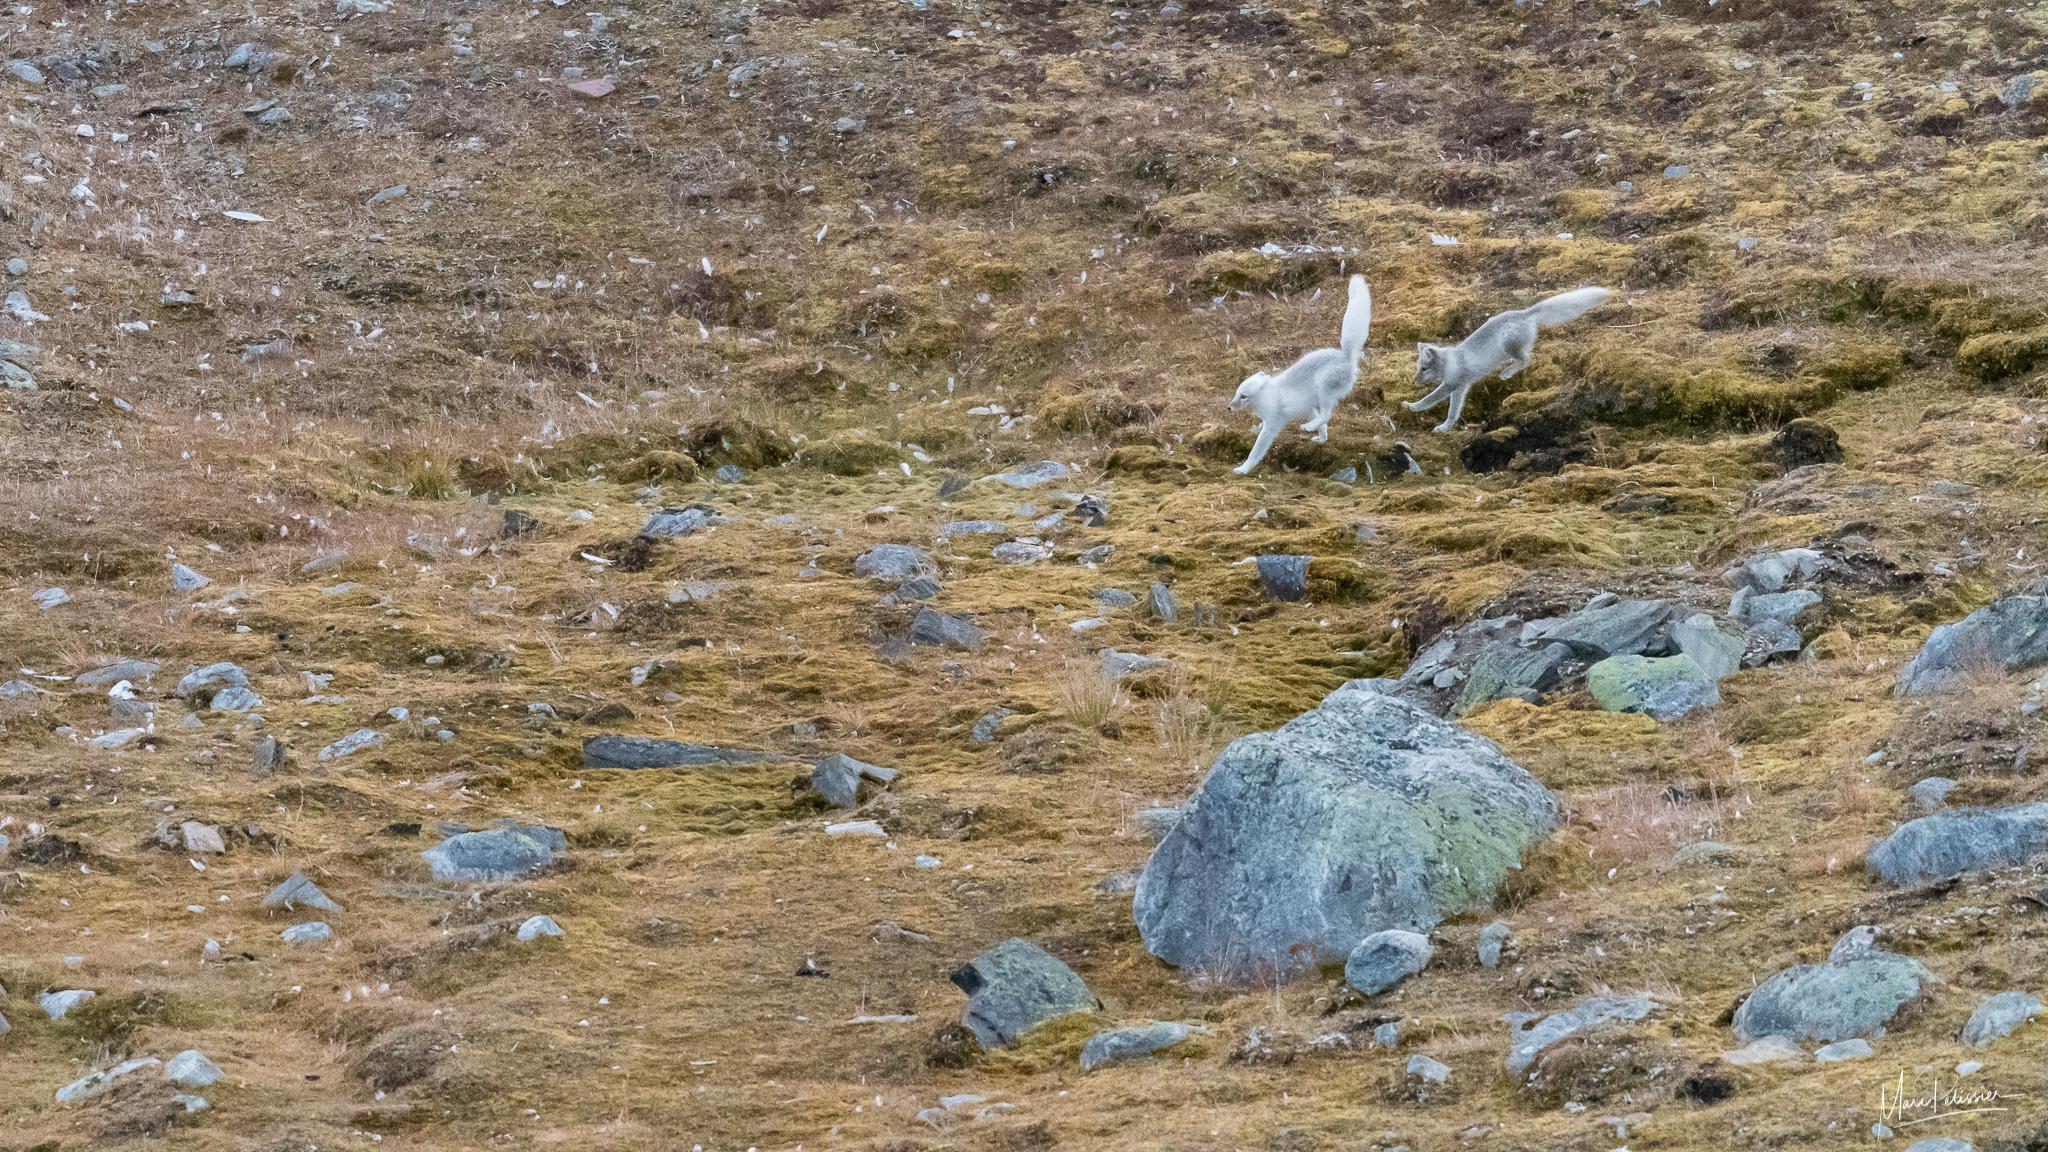 Arctic fox brother playing, Svalbard & Jan Mayen Islands